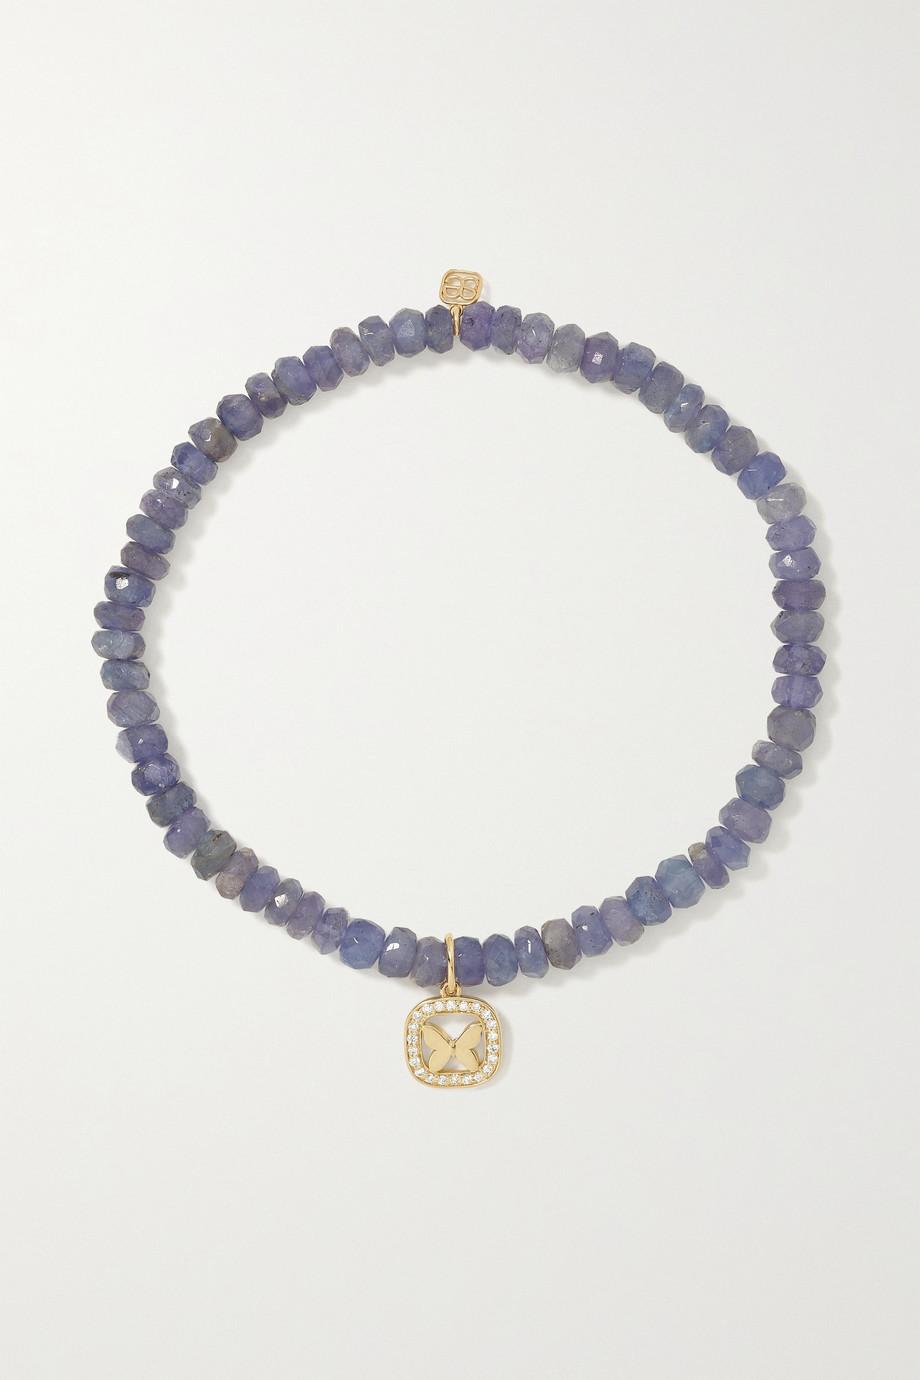 Sydney Evan Bracelet en or 14 carats (585/1000), tanzanites et diamants Butterfly